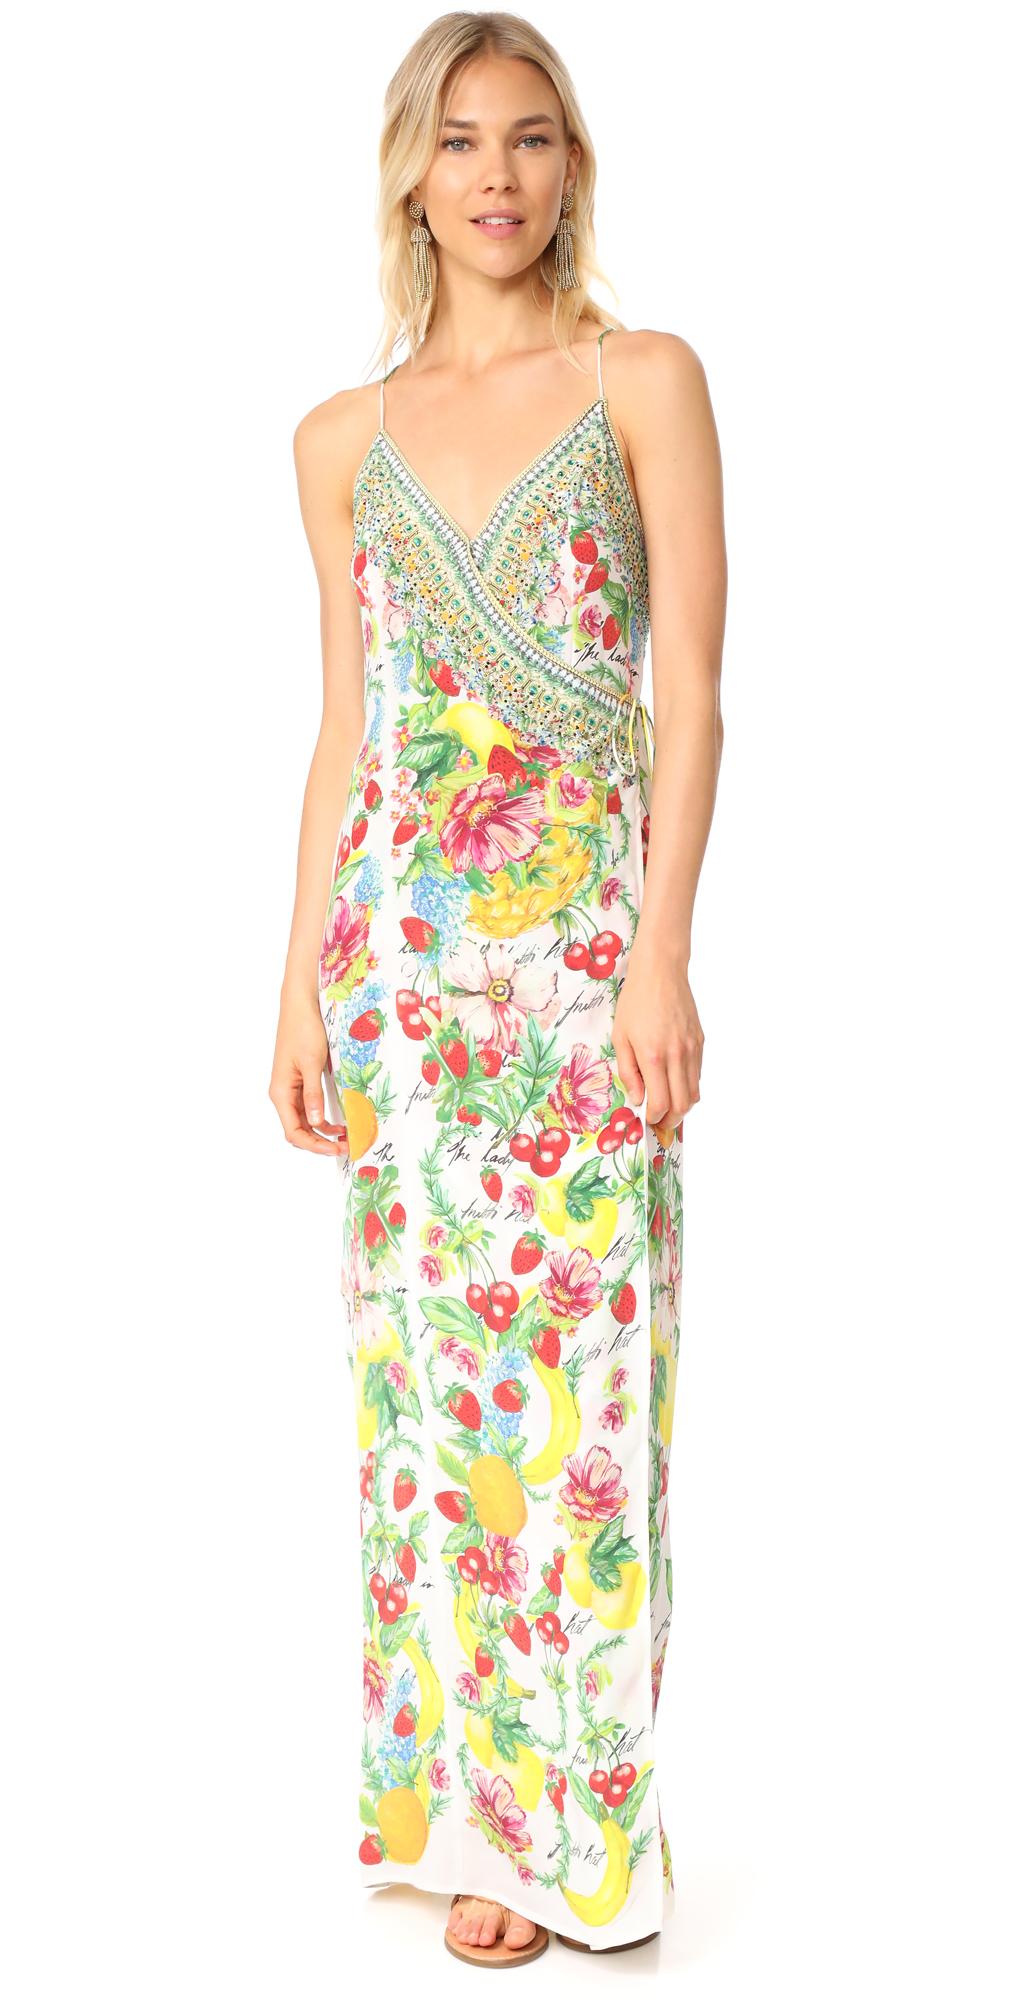 There's No Place Like Rio Wrap Dress Camilla